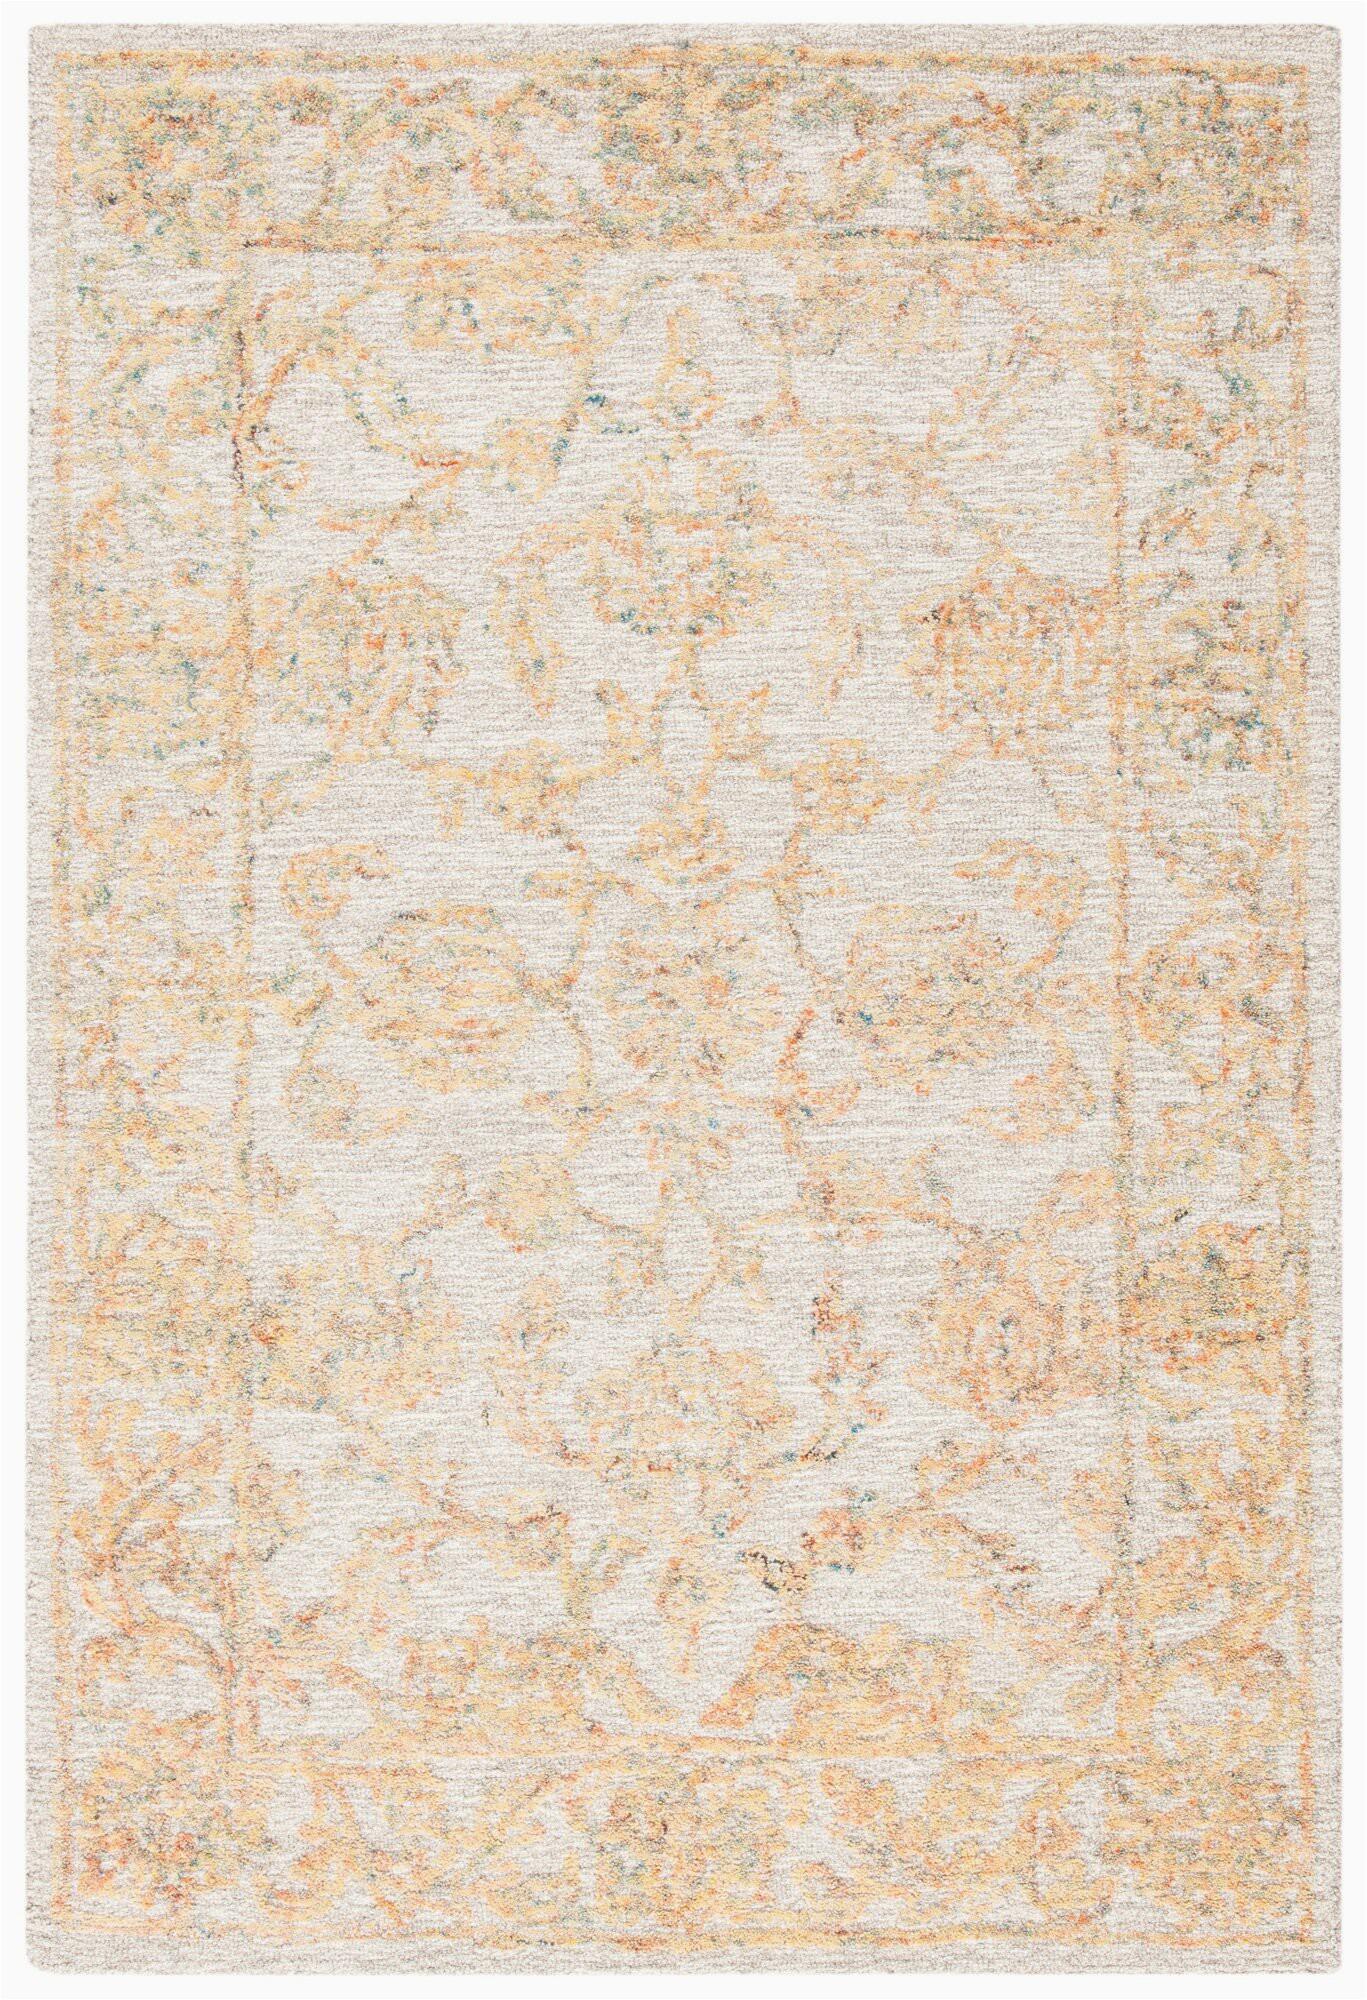 swarey oriental hand tufted wool beigegold area rug